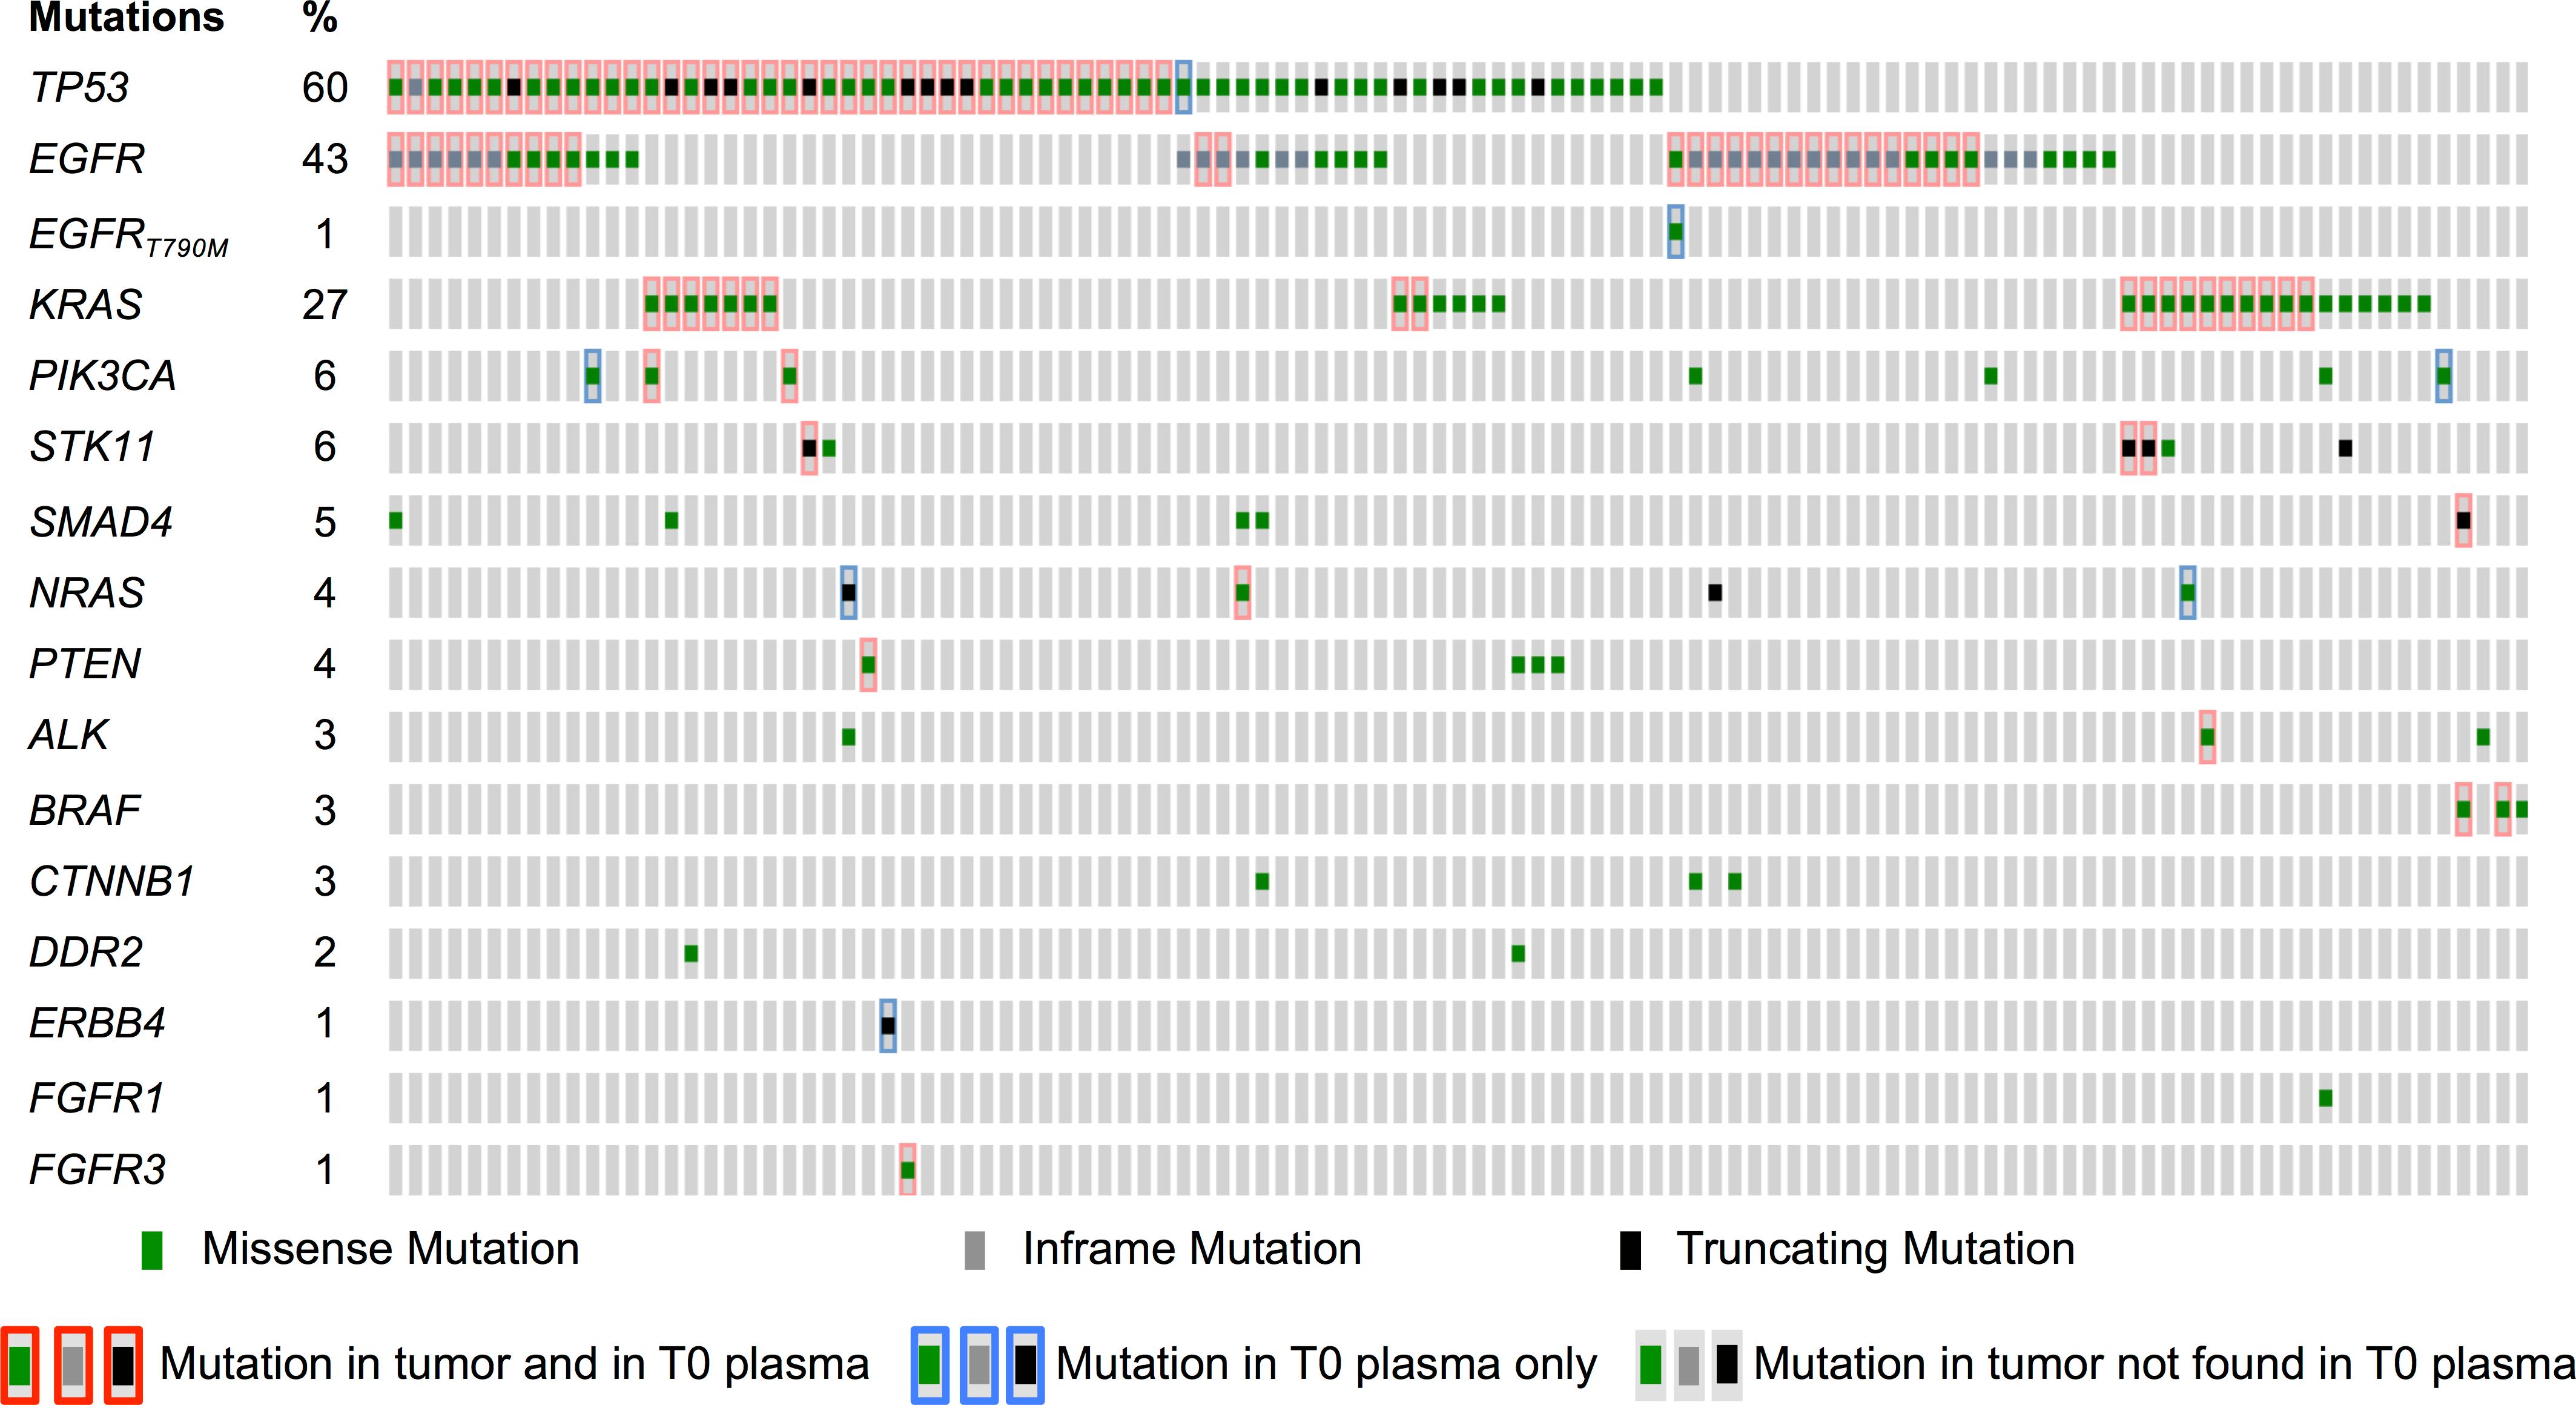 Mutations identified in tumor and in baseline plasma samples.